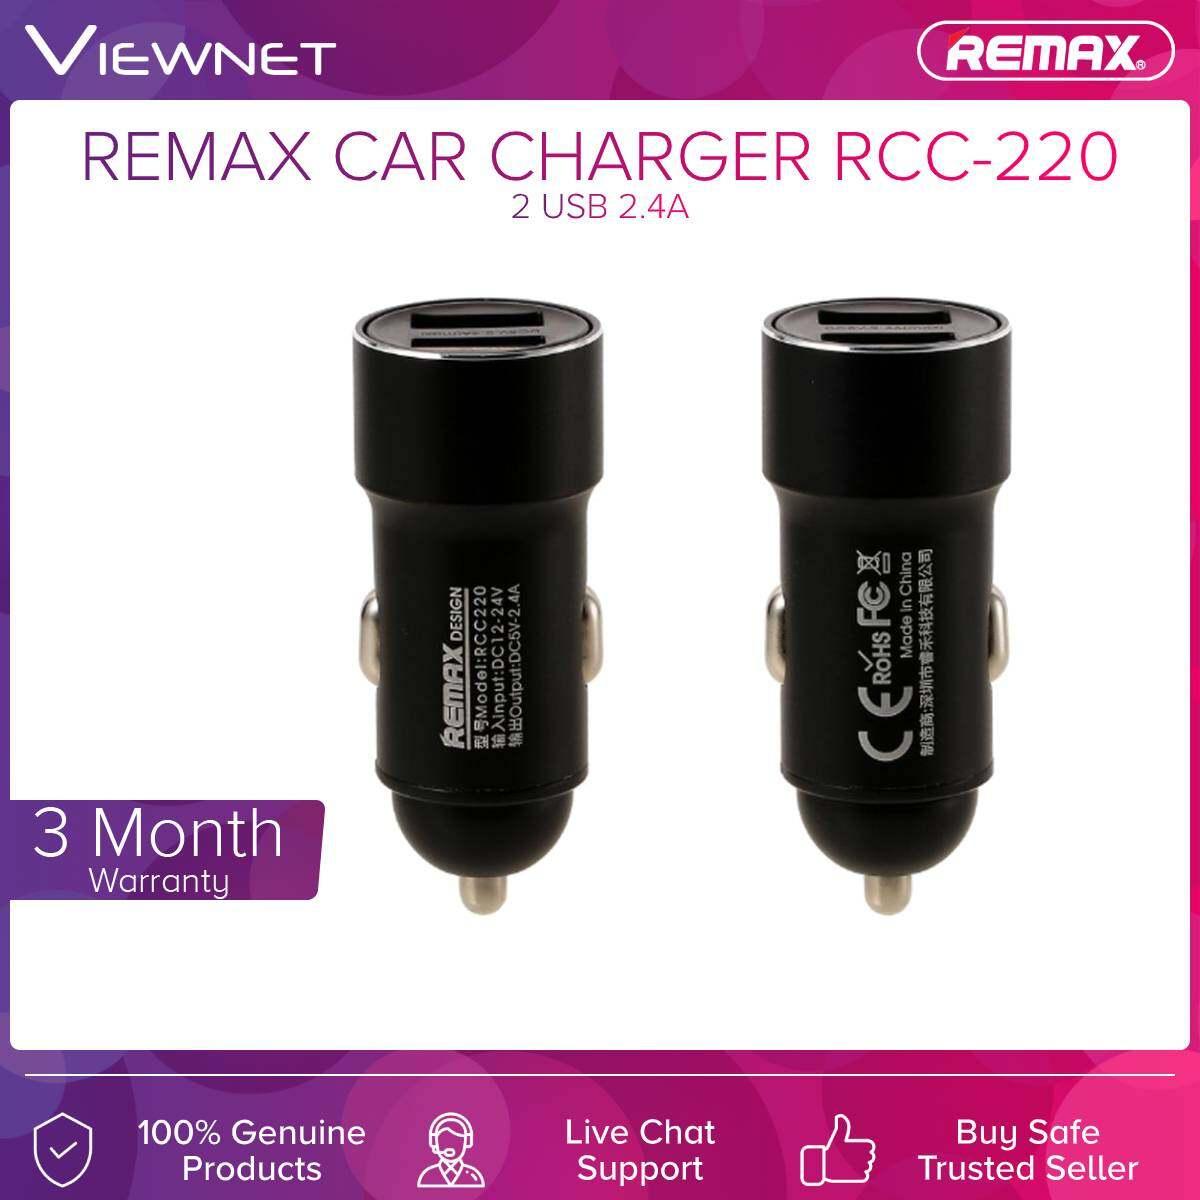 Remax Car Charger Rechan Series 2-Usb 2.4A (RCC-220)